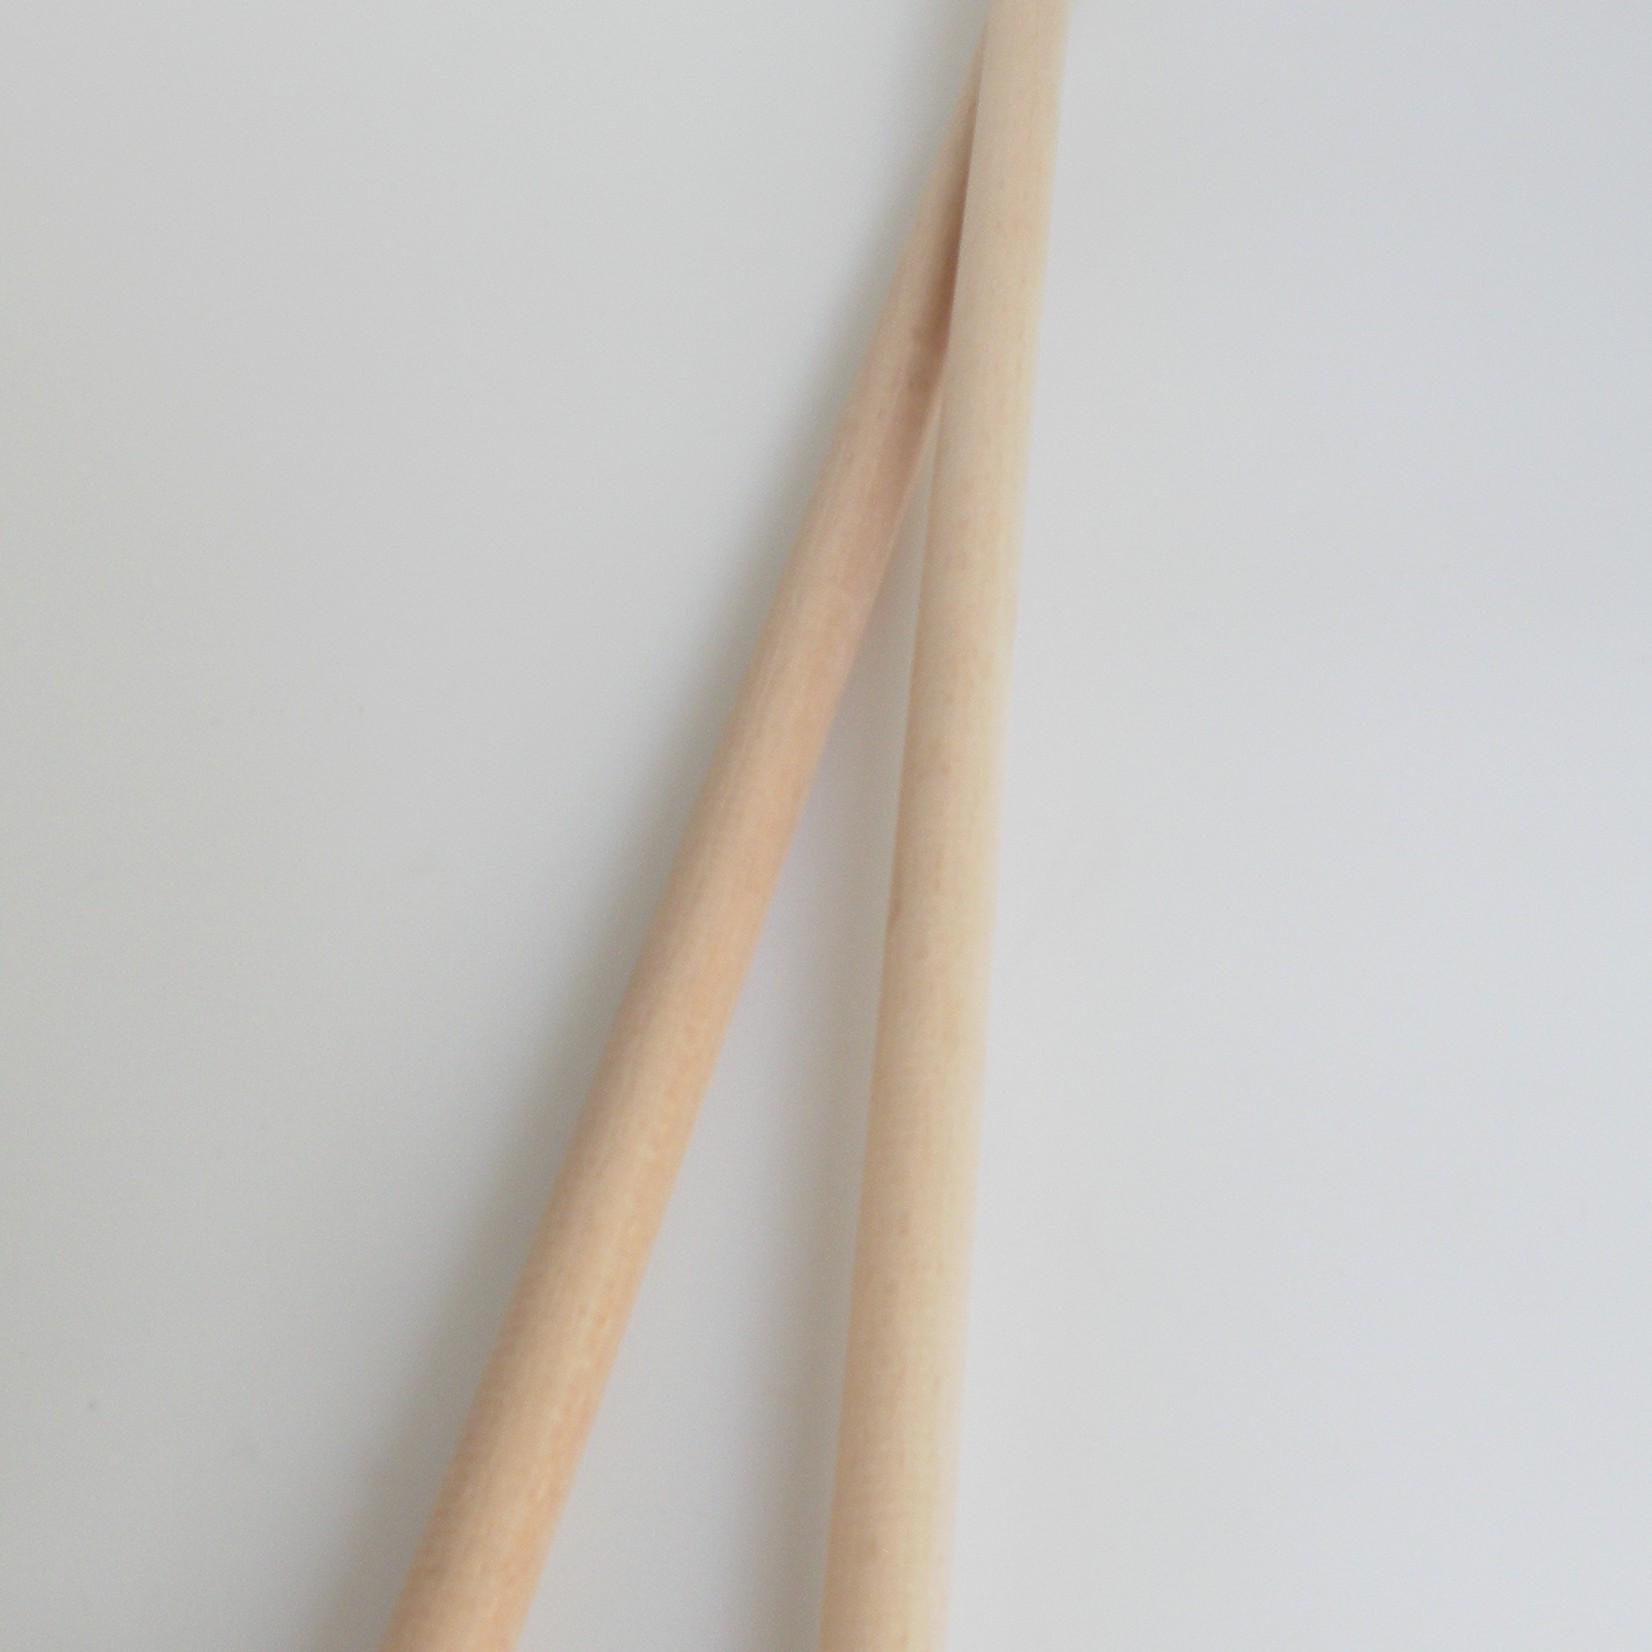 2 blankhouten stokken á 50cm